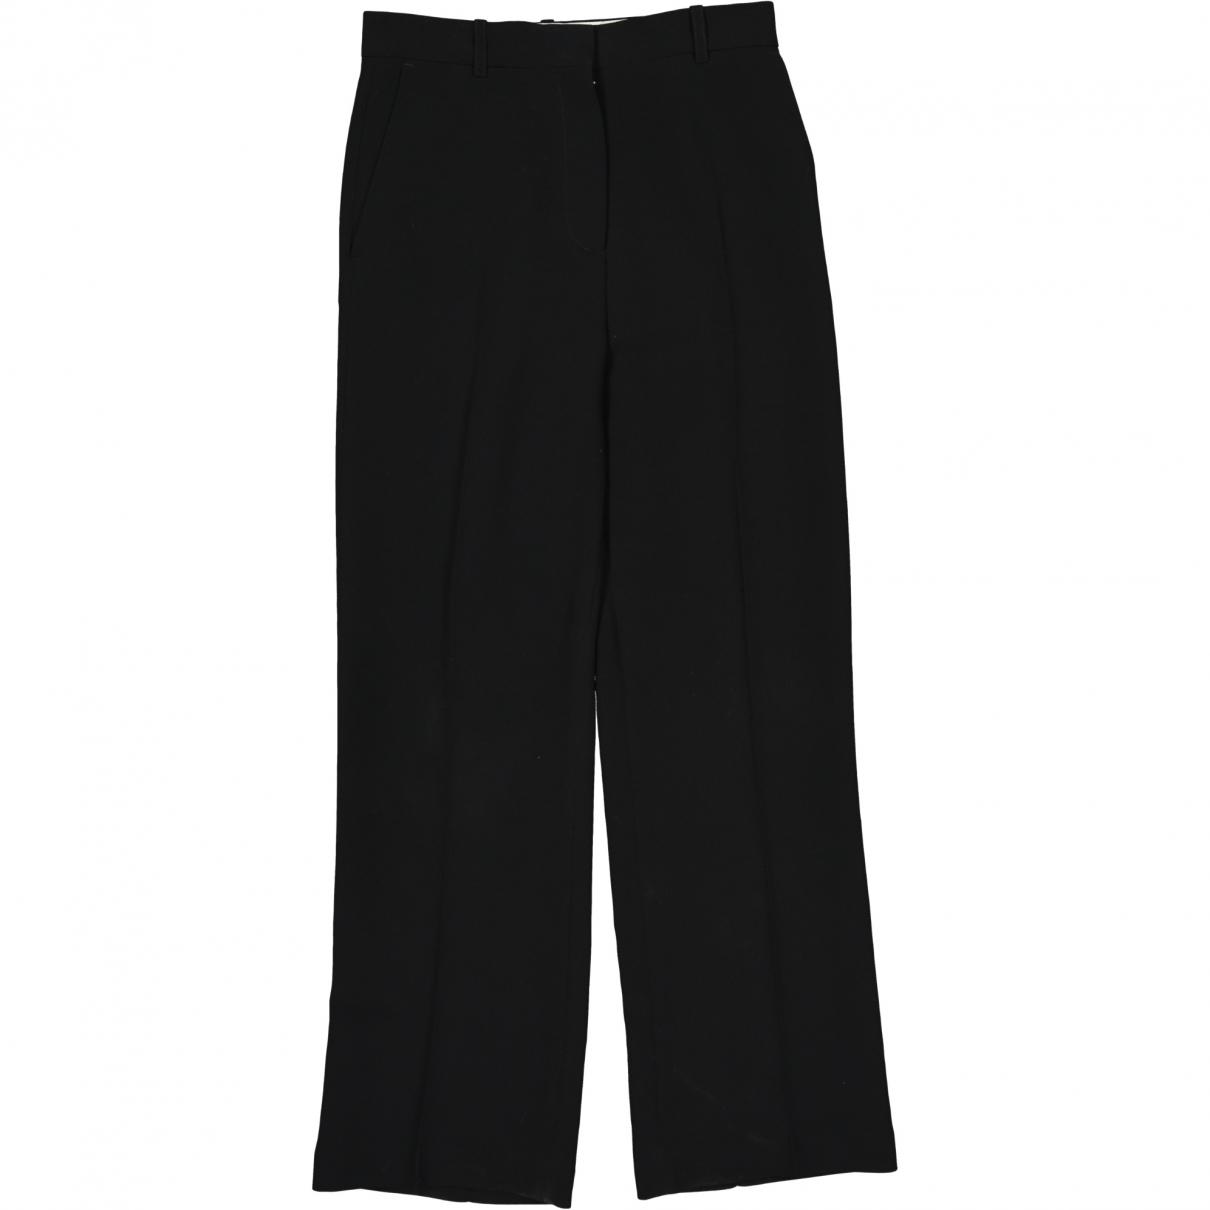 Acne Studios \N Black Trousers for Women 34 FR